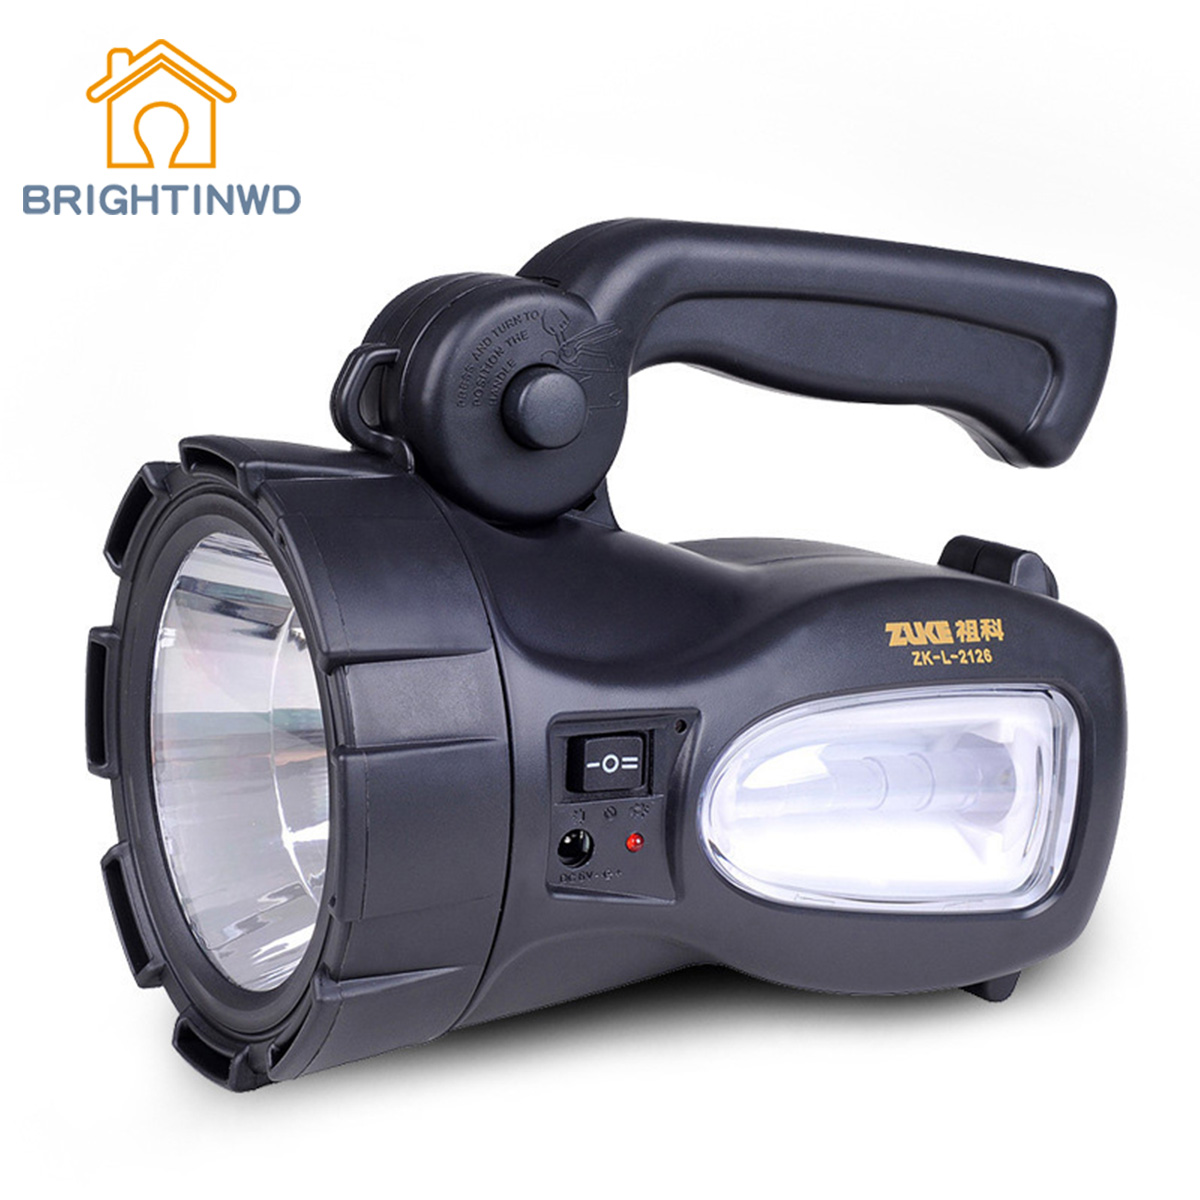 BRIGHTINWD Glare Charge LED Long-Range Handheld Searchlight Home Camping Lantern Rainproof glare 30